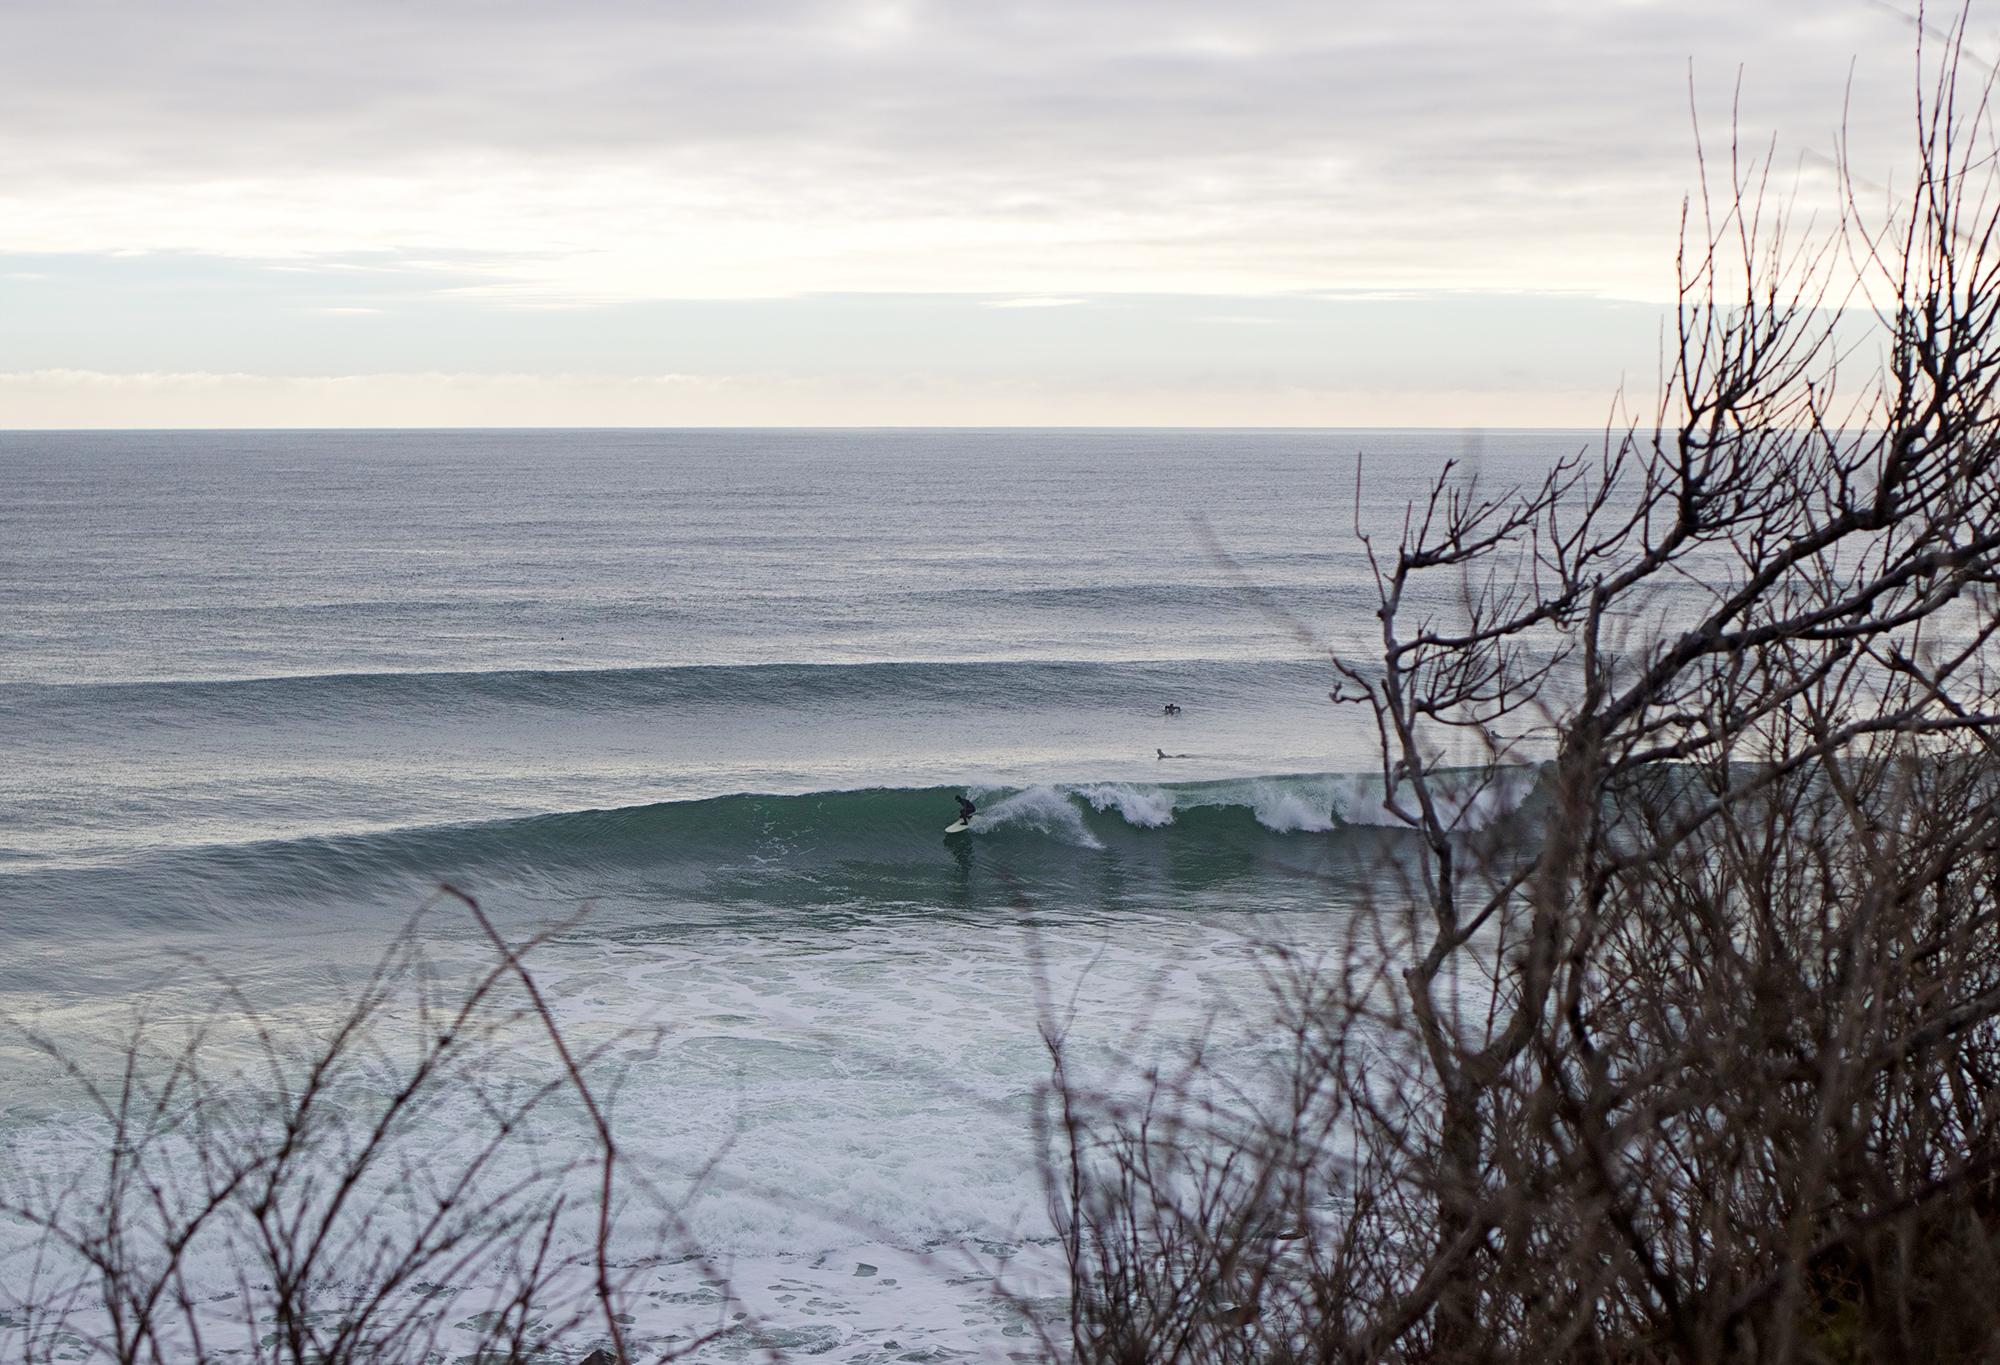 1-19-17 MTK Surfer 15.jpg